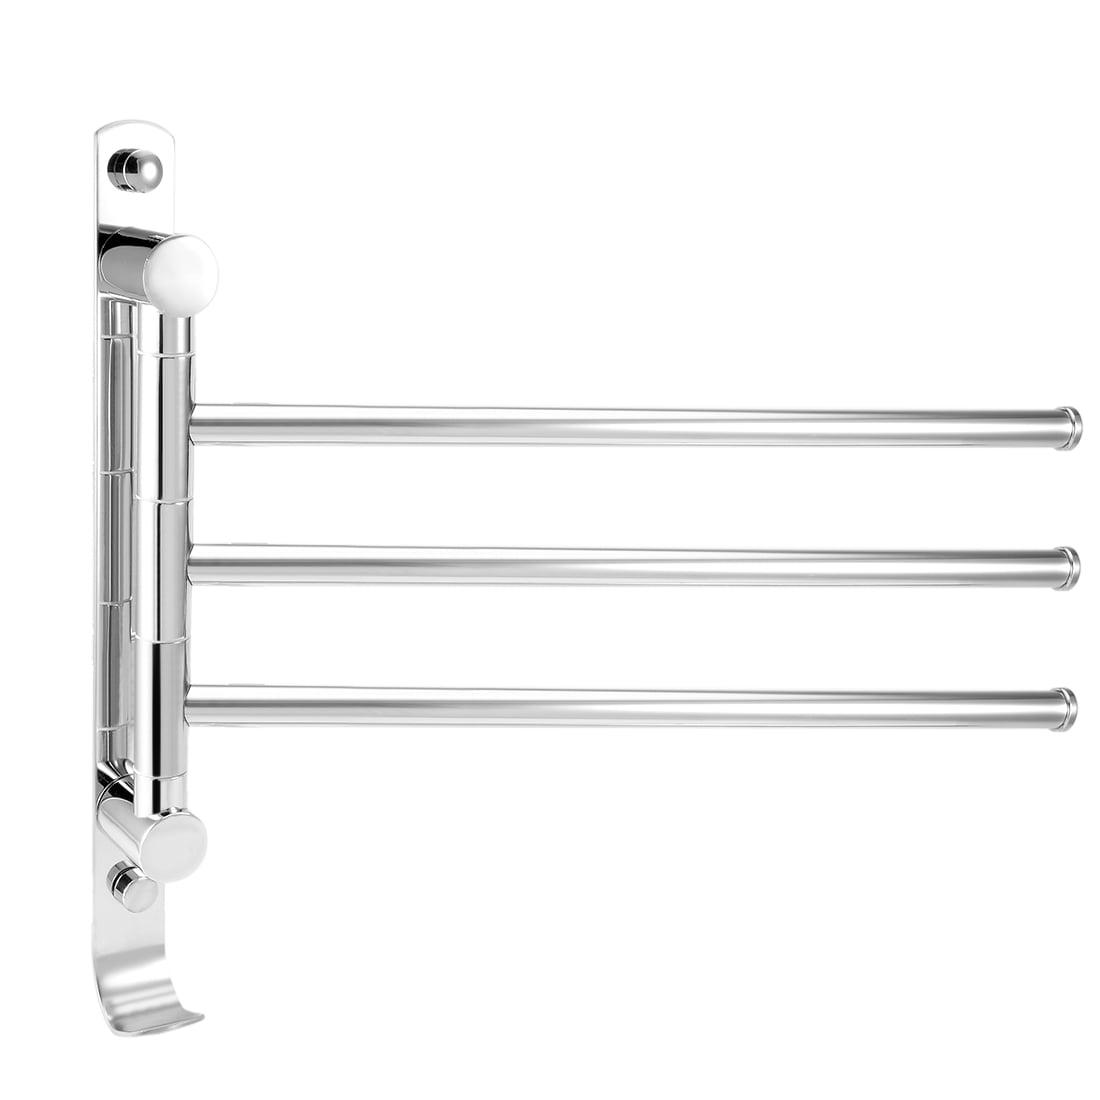 201 Stainless Steel 3 Bar Folding Arm Swivel Hanger Towel Rail Chrome Planted - image 4 of 4